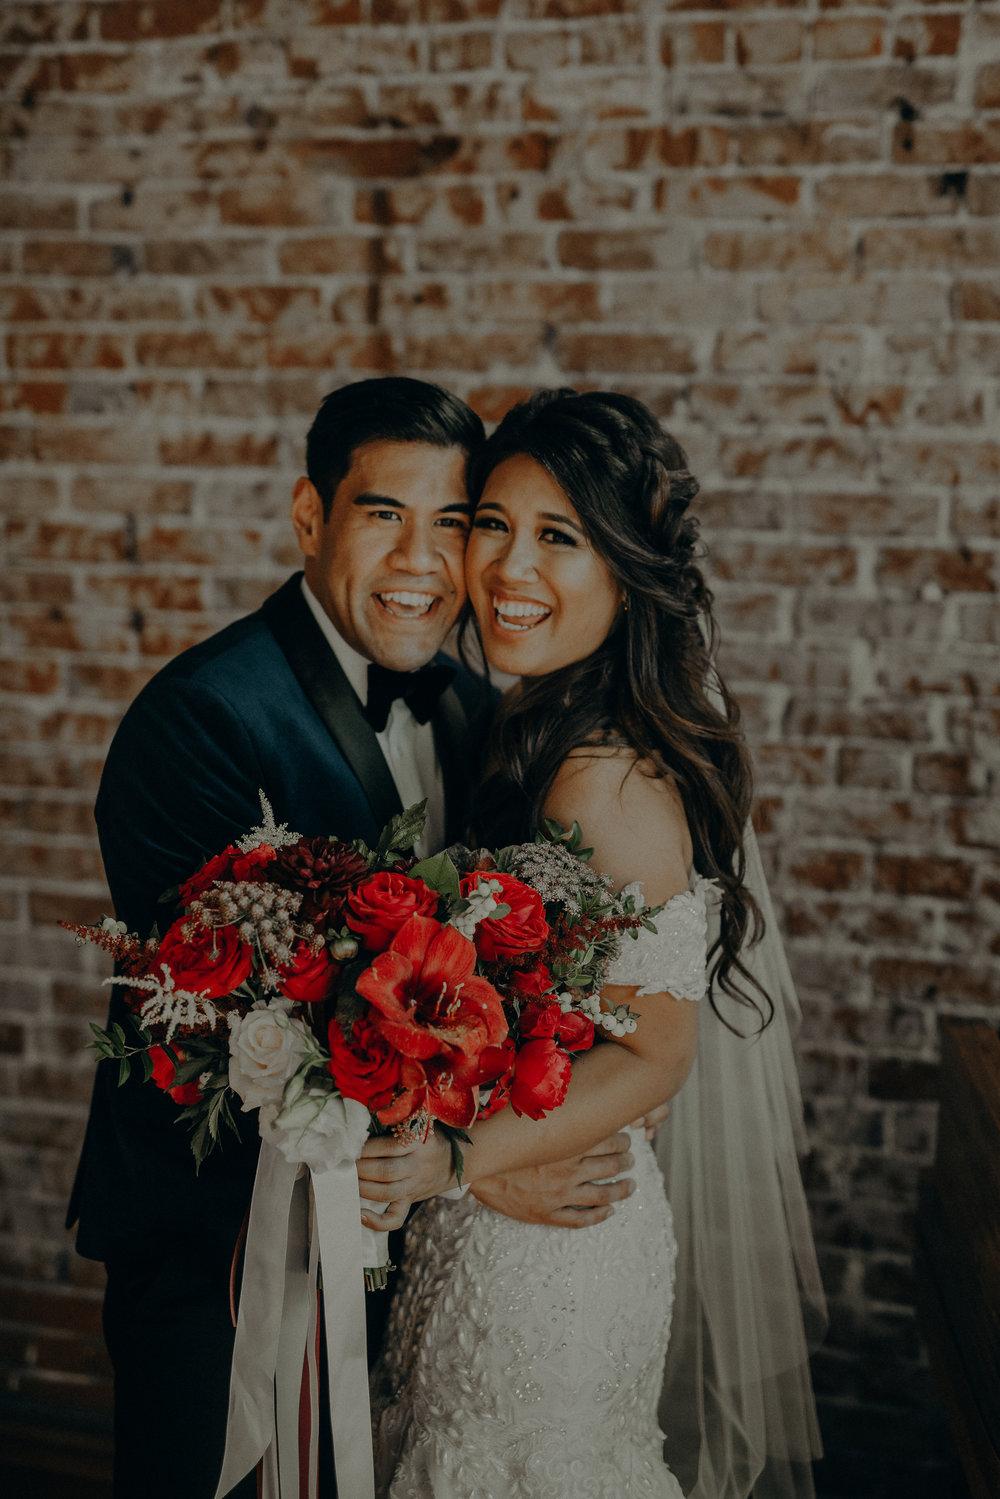 ©Isaiah + Taylor Photography - the Loft on Pine Wedding, Long Beach Wedding Photographer-116.jpg